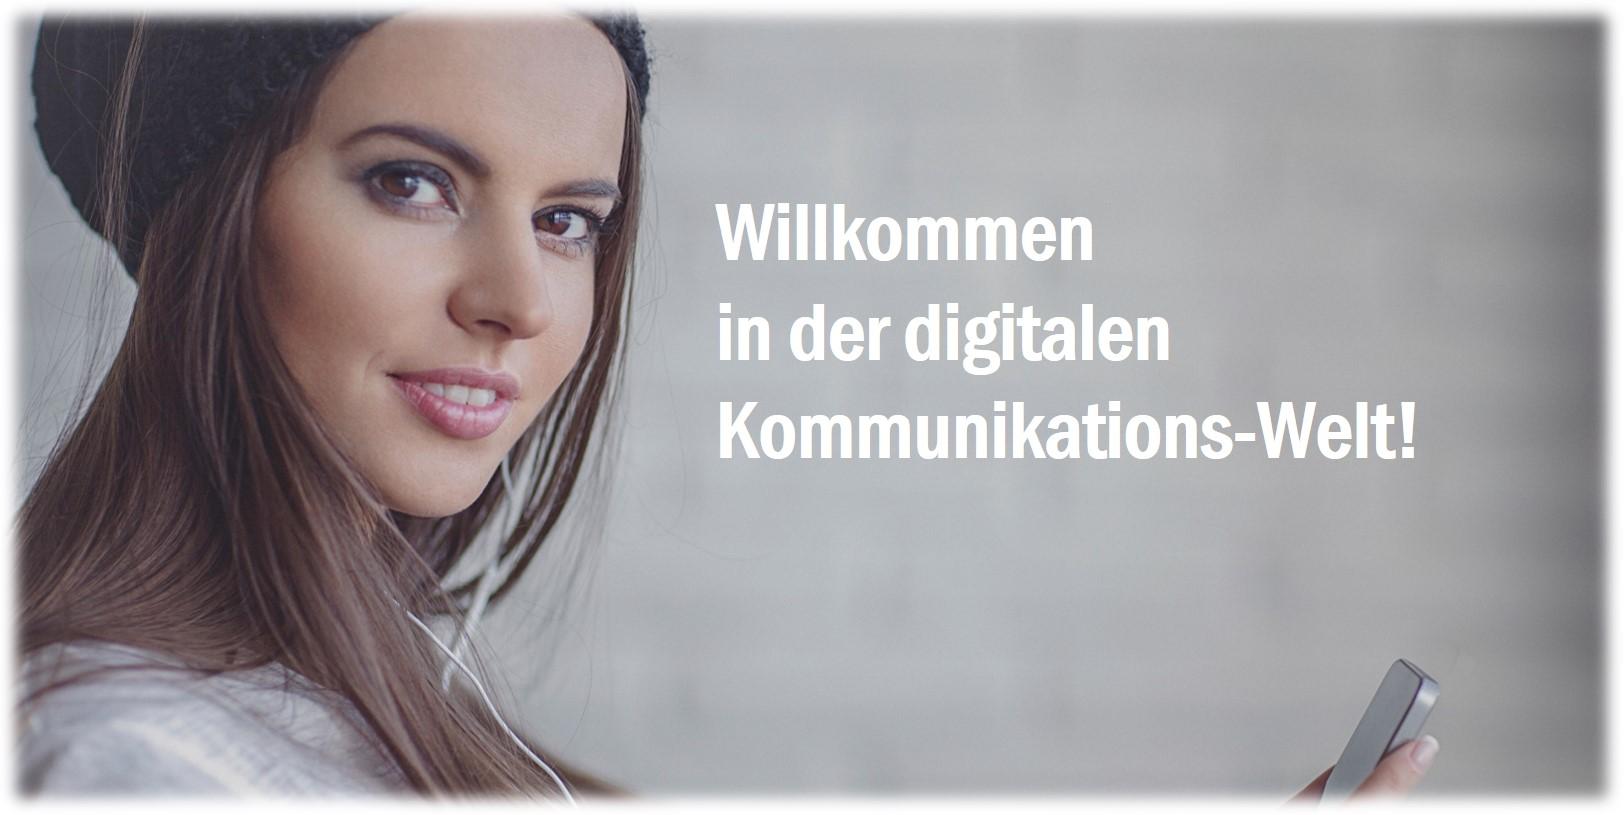 Digitale Kommunkationswelt_SonjaDirr_apricot.jpg